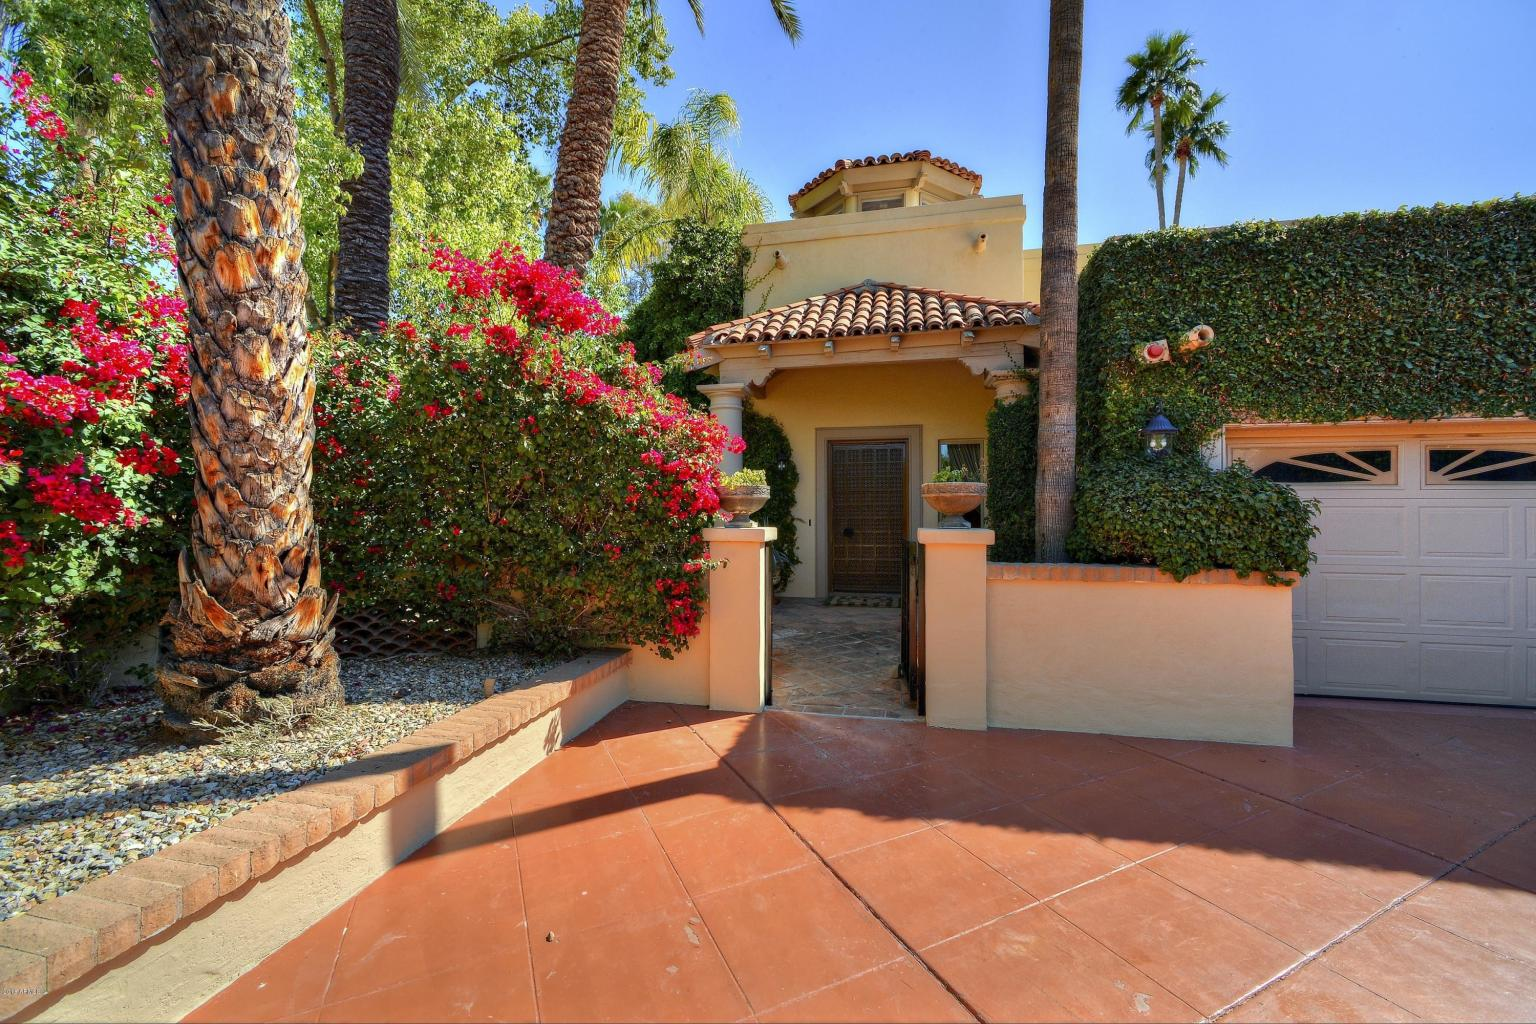 7500 E McCormick Pkwy 19, Scottsdale | $970,000